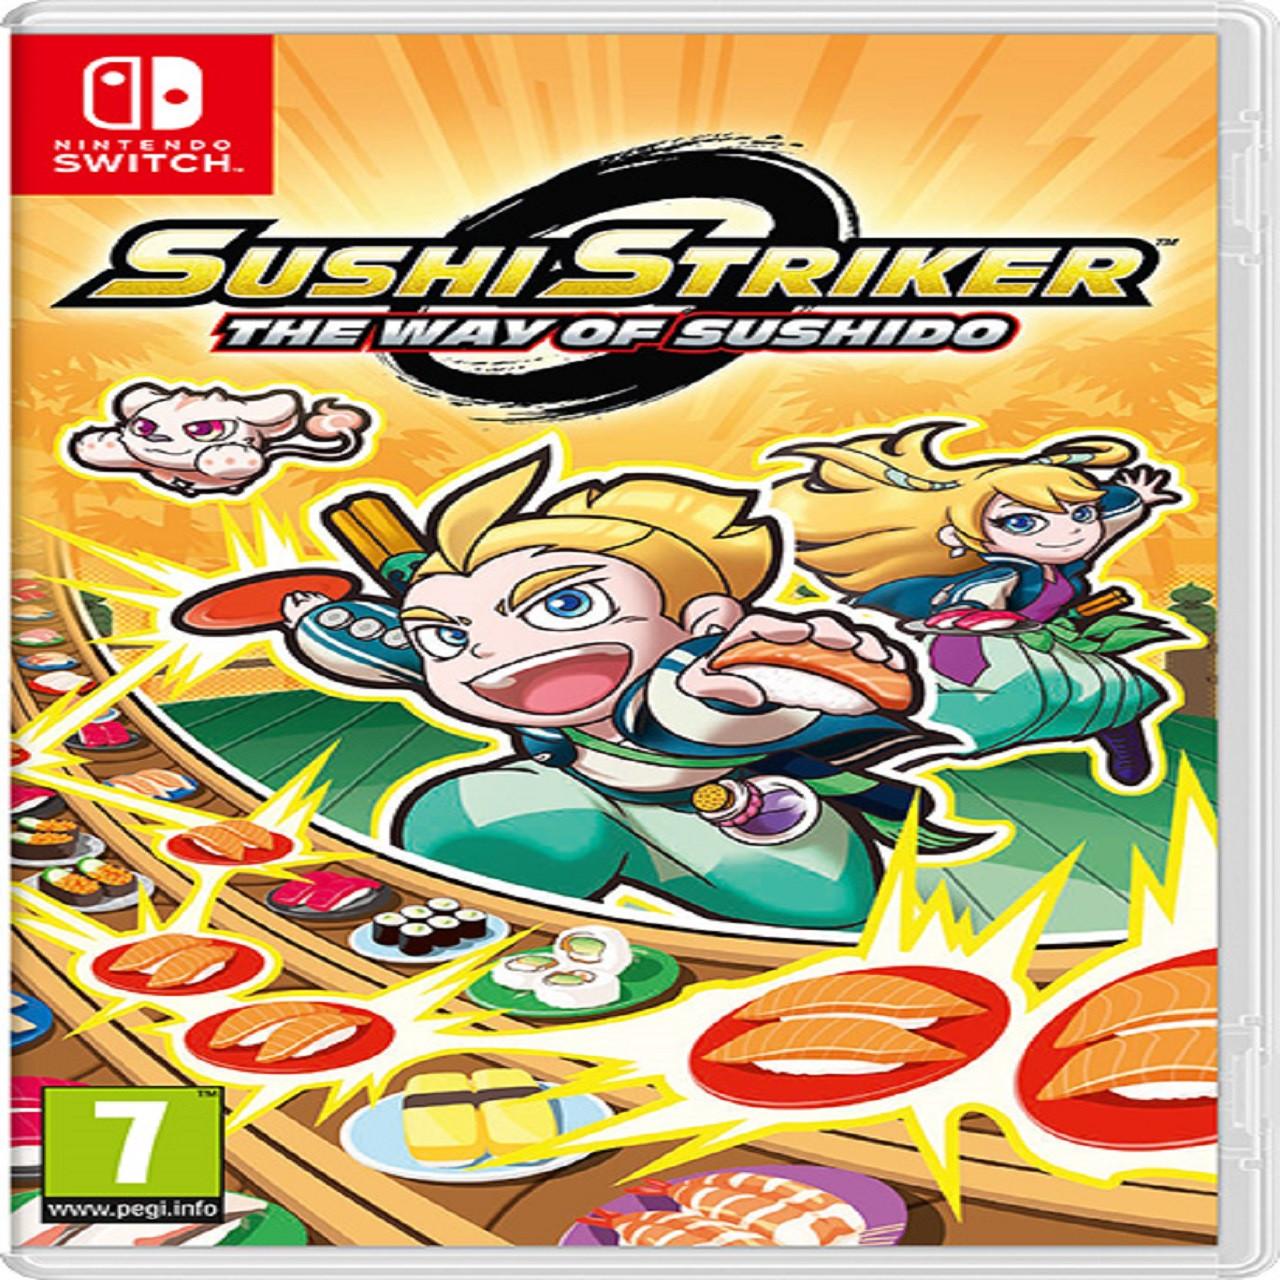 Sushi Striker: The Way of Sushido (англійська версія) Nintendo Switch